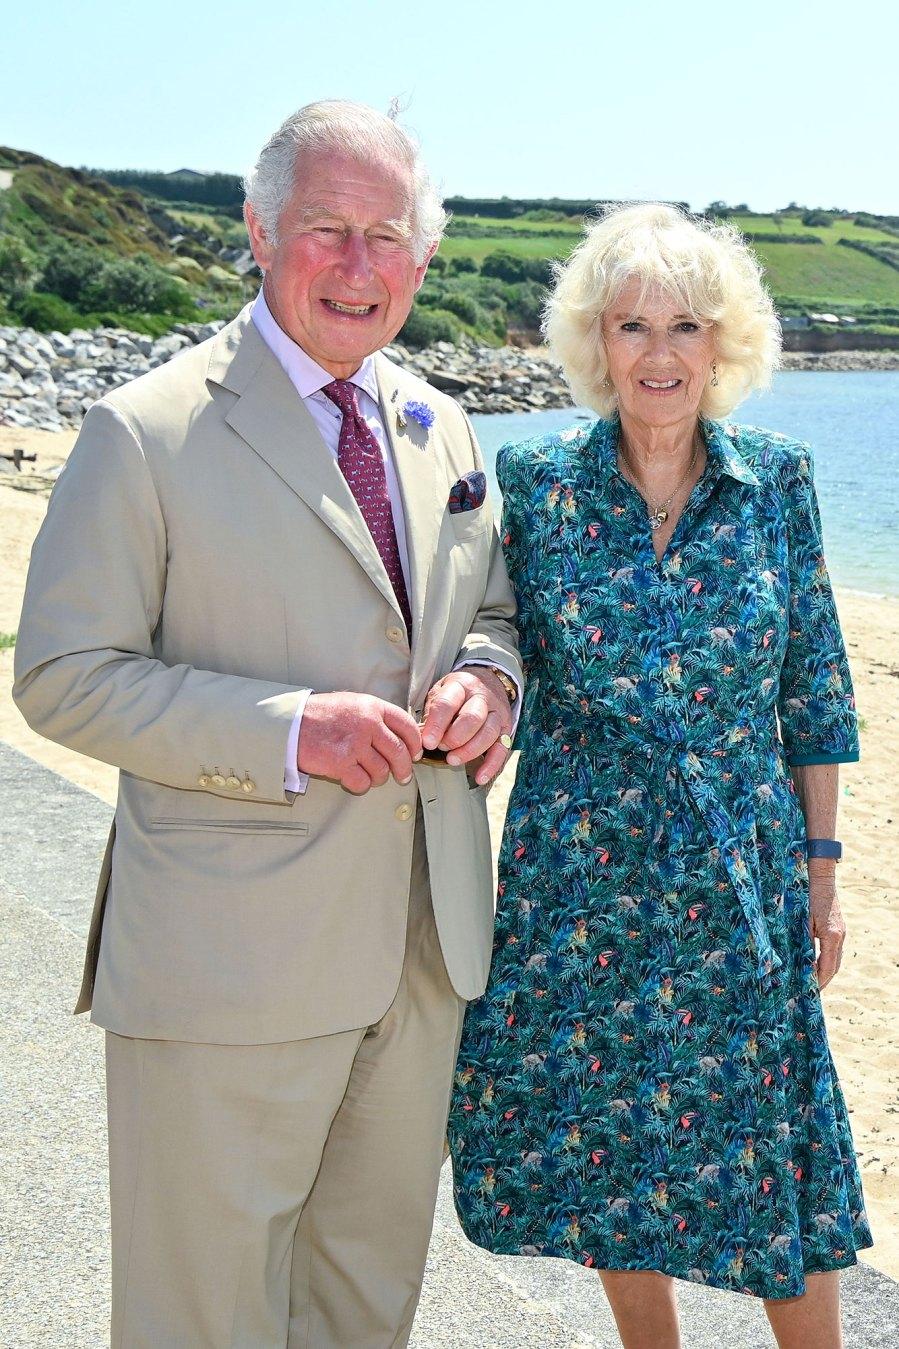 Prince Charles and Duchess Camilla Wish Prince Harry a Happy Birthday